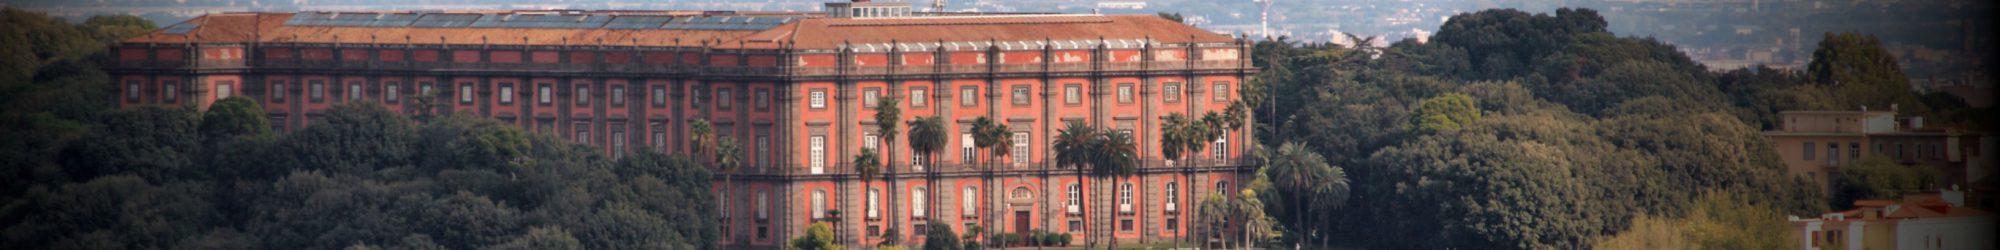 musei-palazzi-napoli-fiorentini-residence